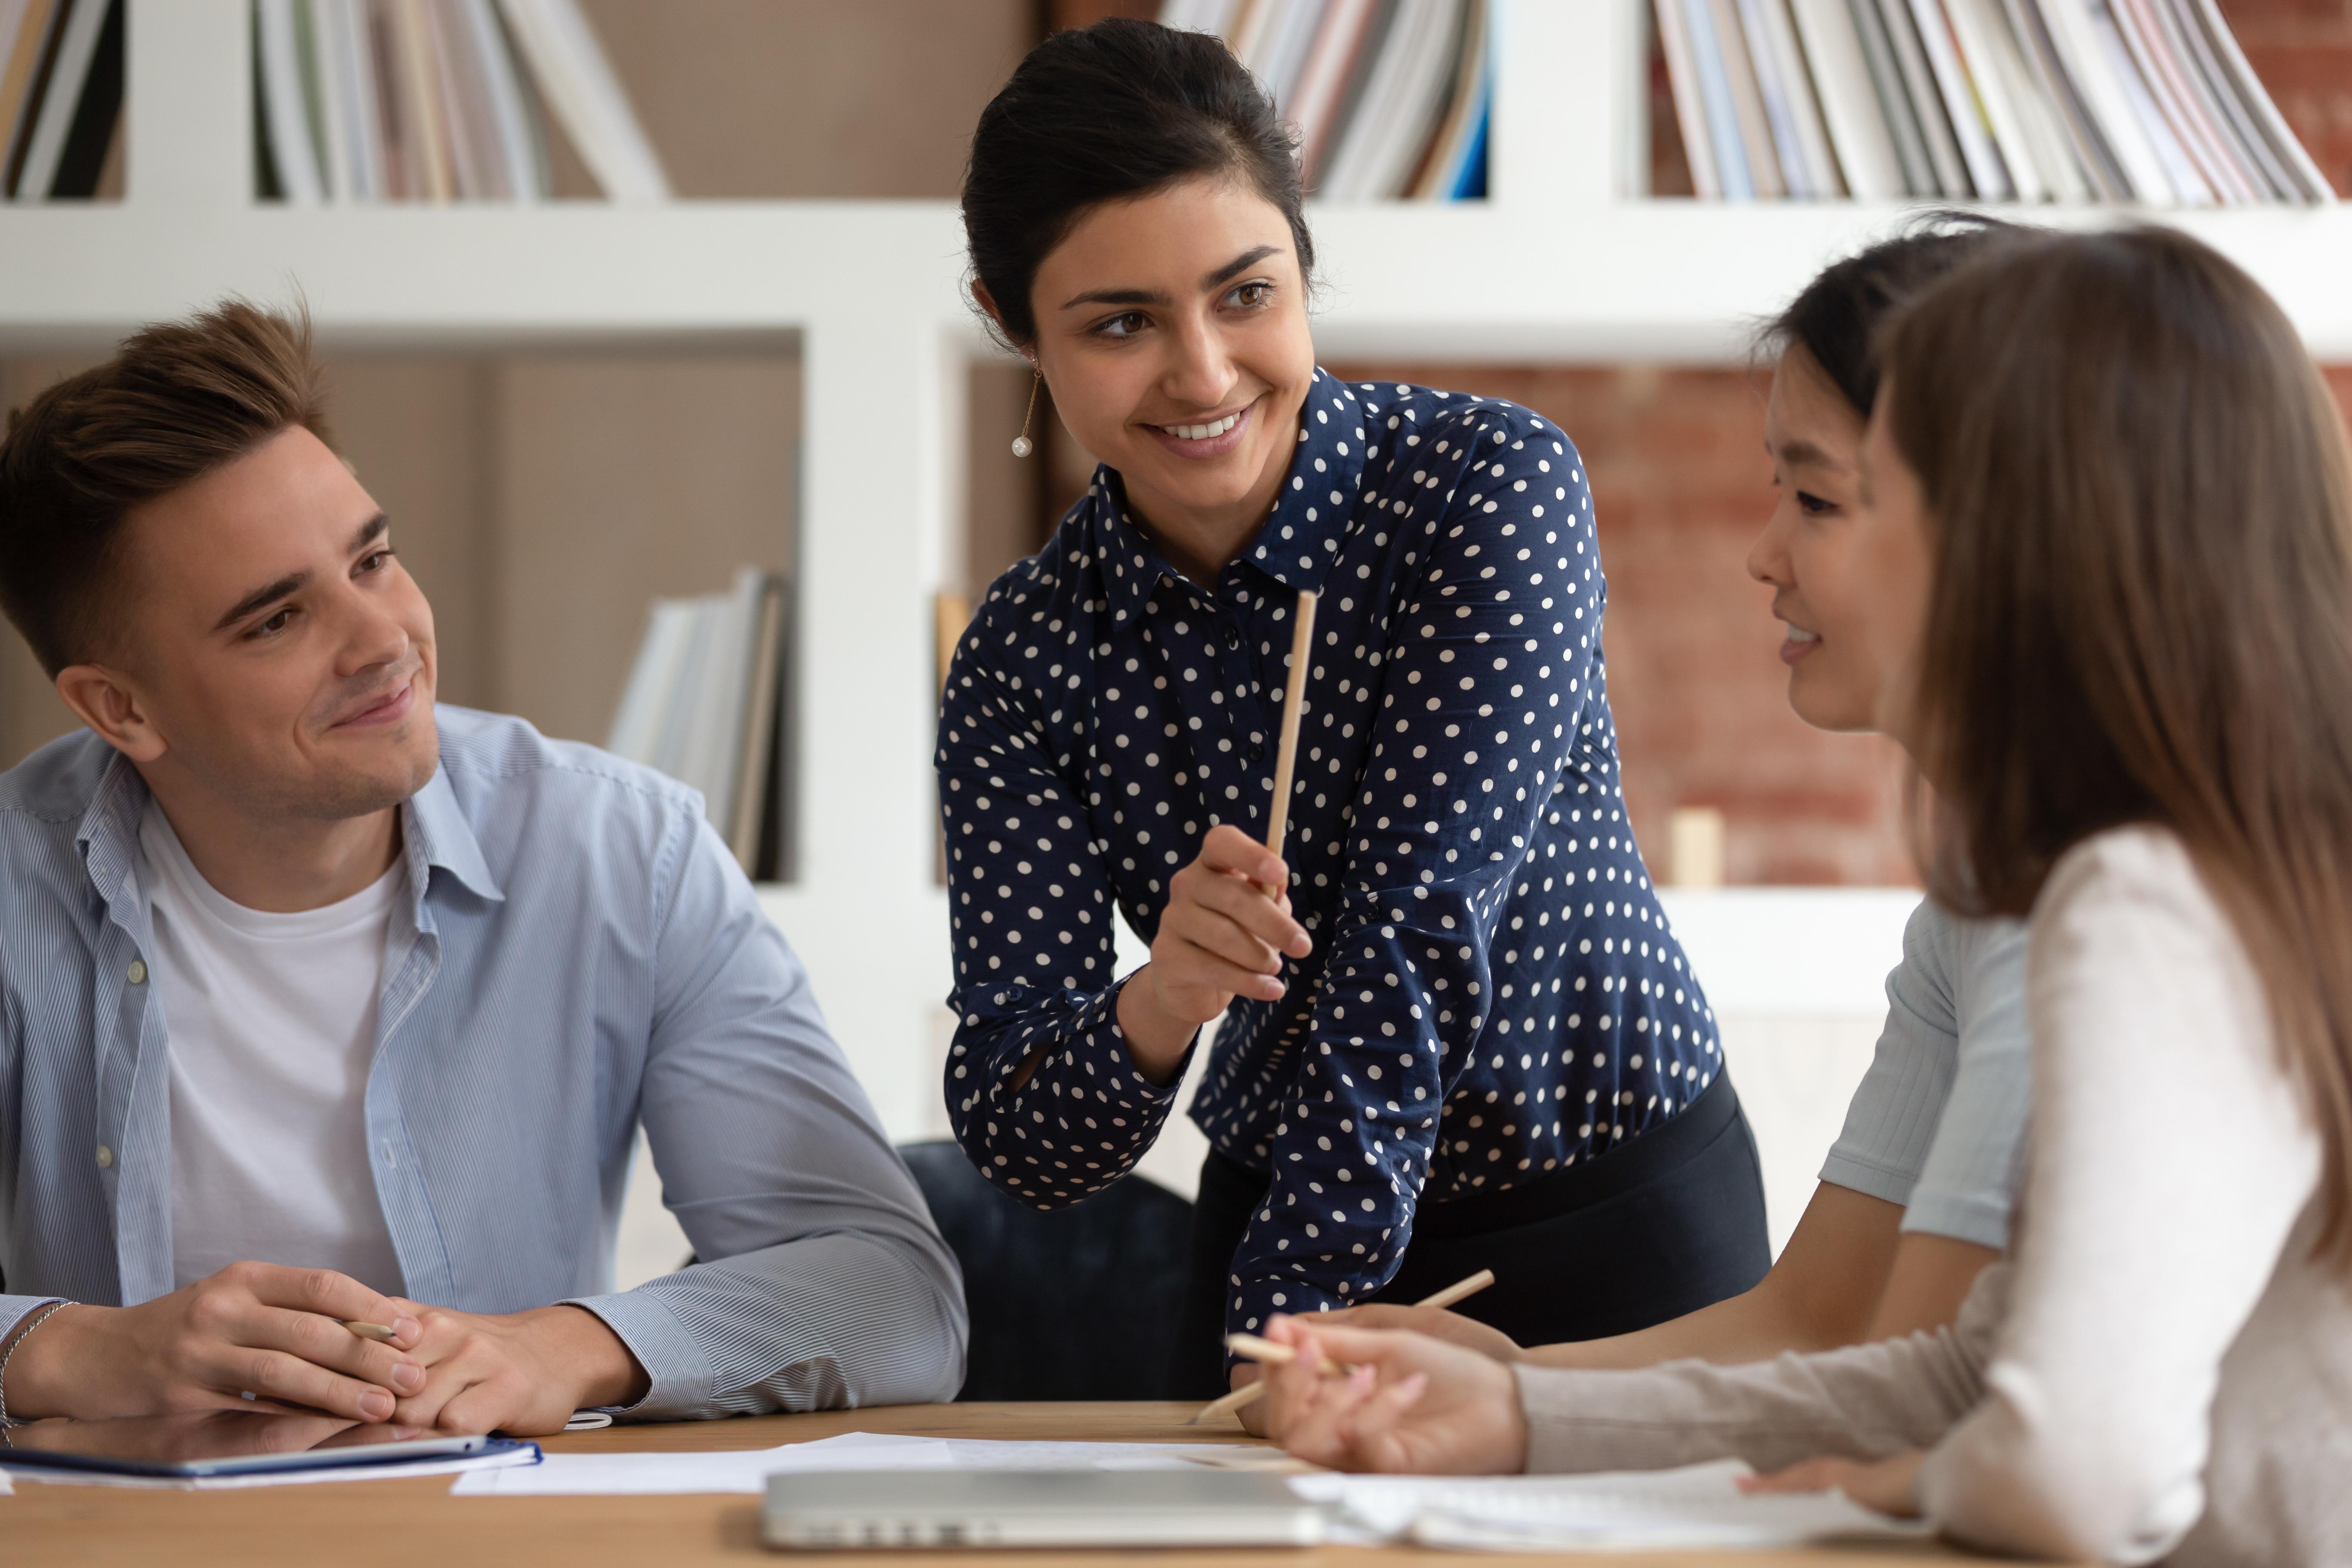 Summer Program - Real Estate | InternWorks: Summer/Virtual Summer60, School Year/Virtual SchoolYear60, Gap Year/Virtual Gap Year120 Internship Programs